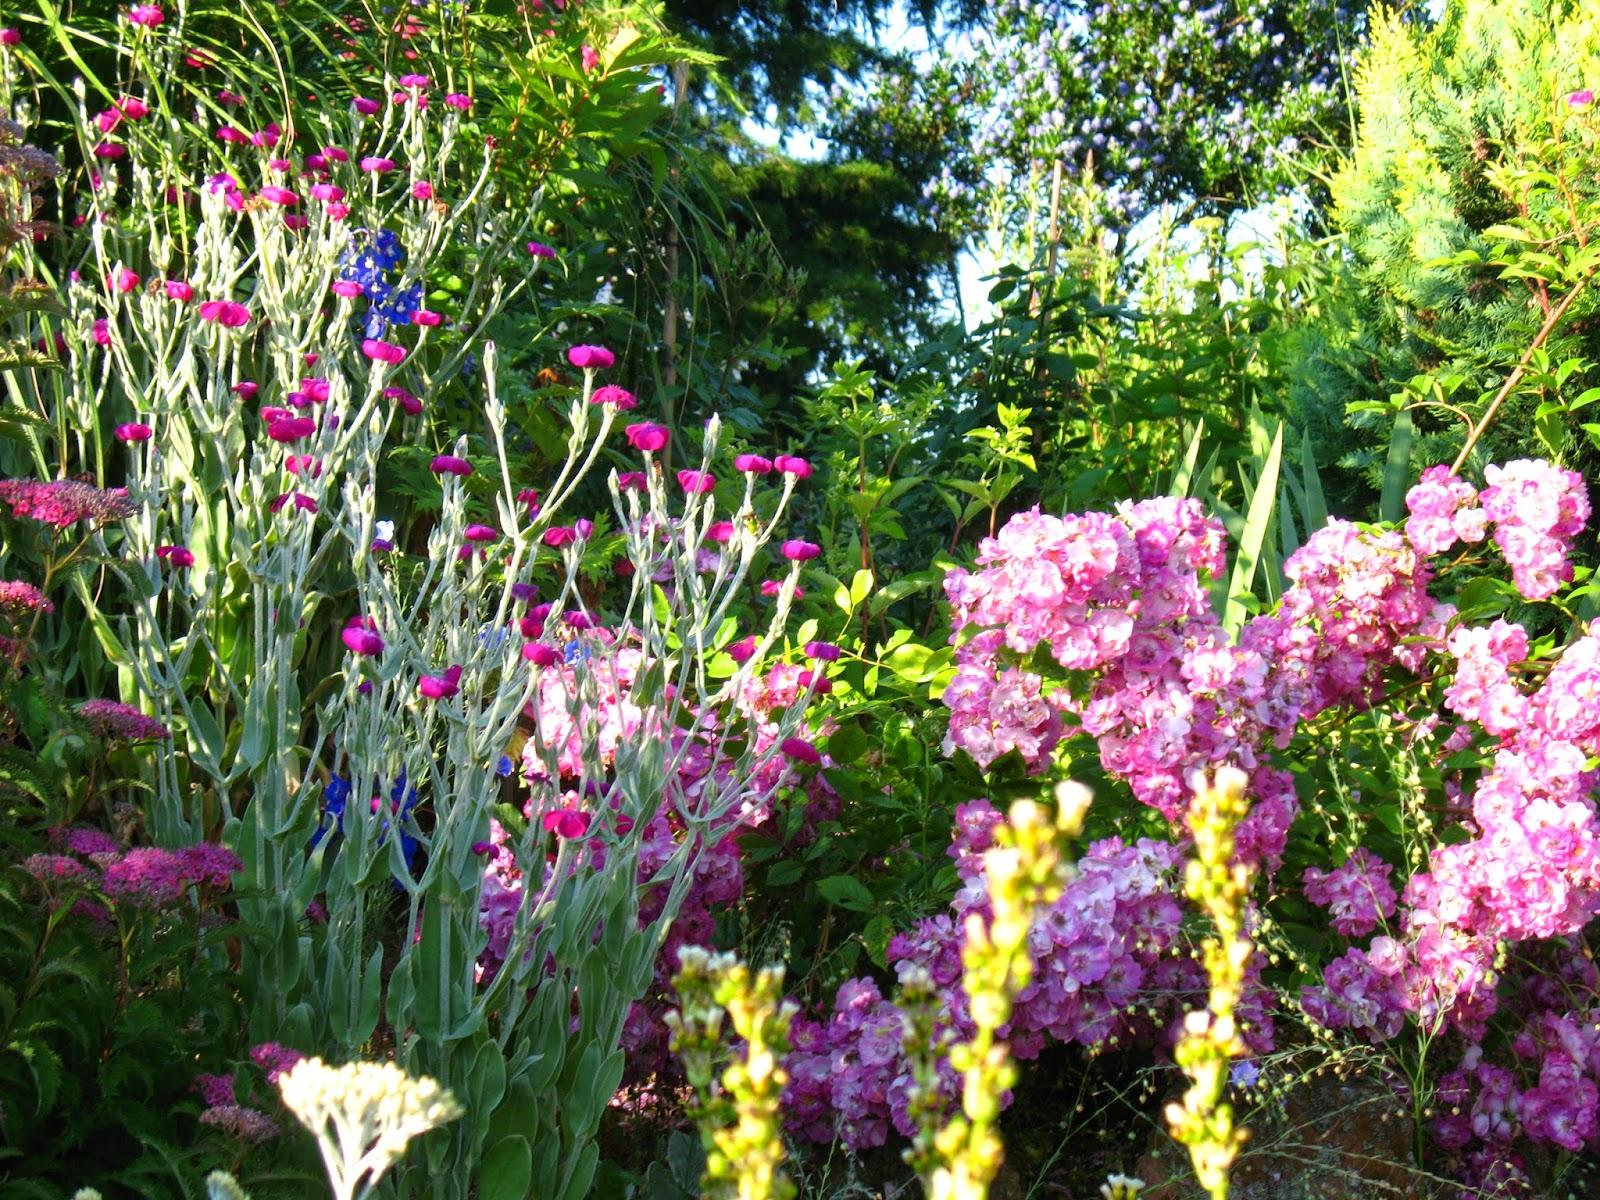 Roses du jardin ch neland lychnis coronaria coquelourde - Coquelourde des jardins lychnis coronaria ...